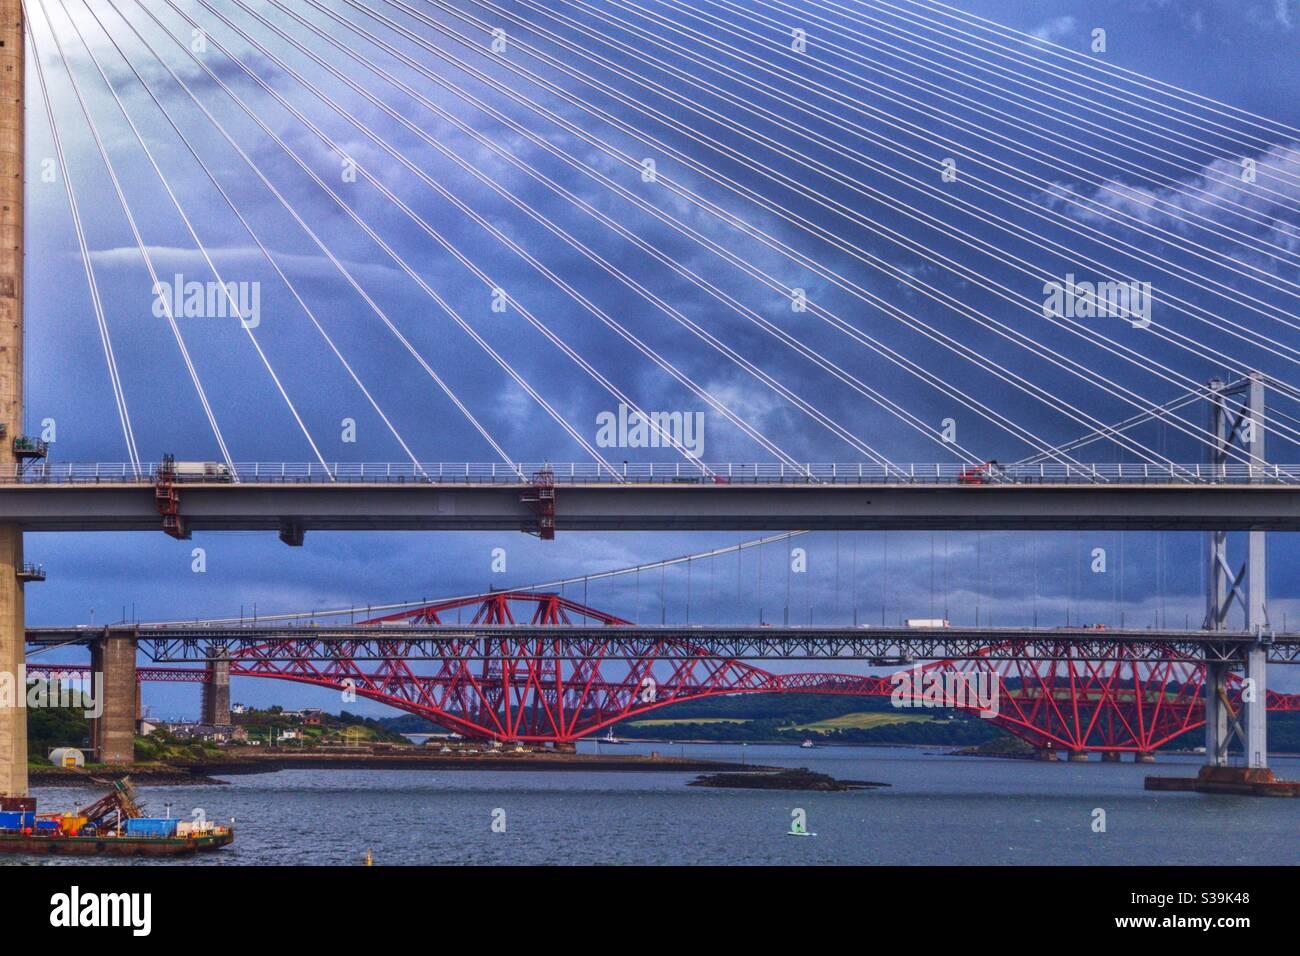 Queensferry crossing, Forth Road bridge and Forth bridge over the River Forth in Edinburgh, Scotland. Stock Photo